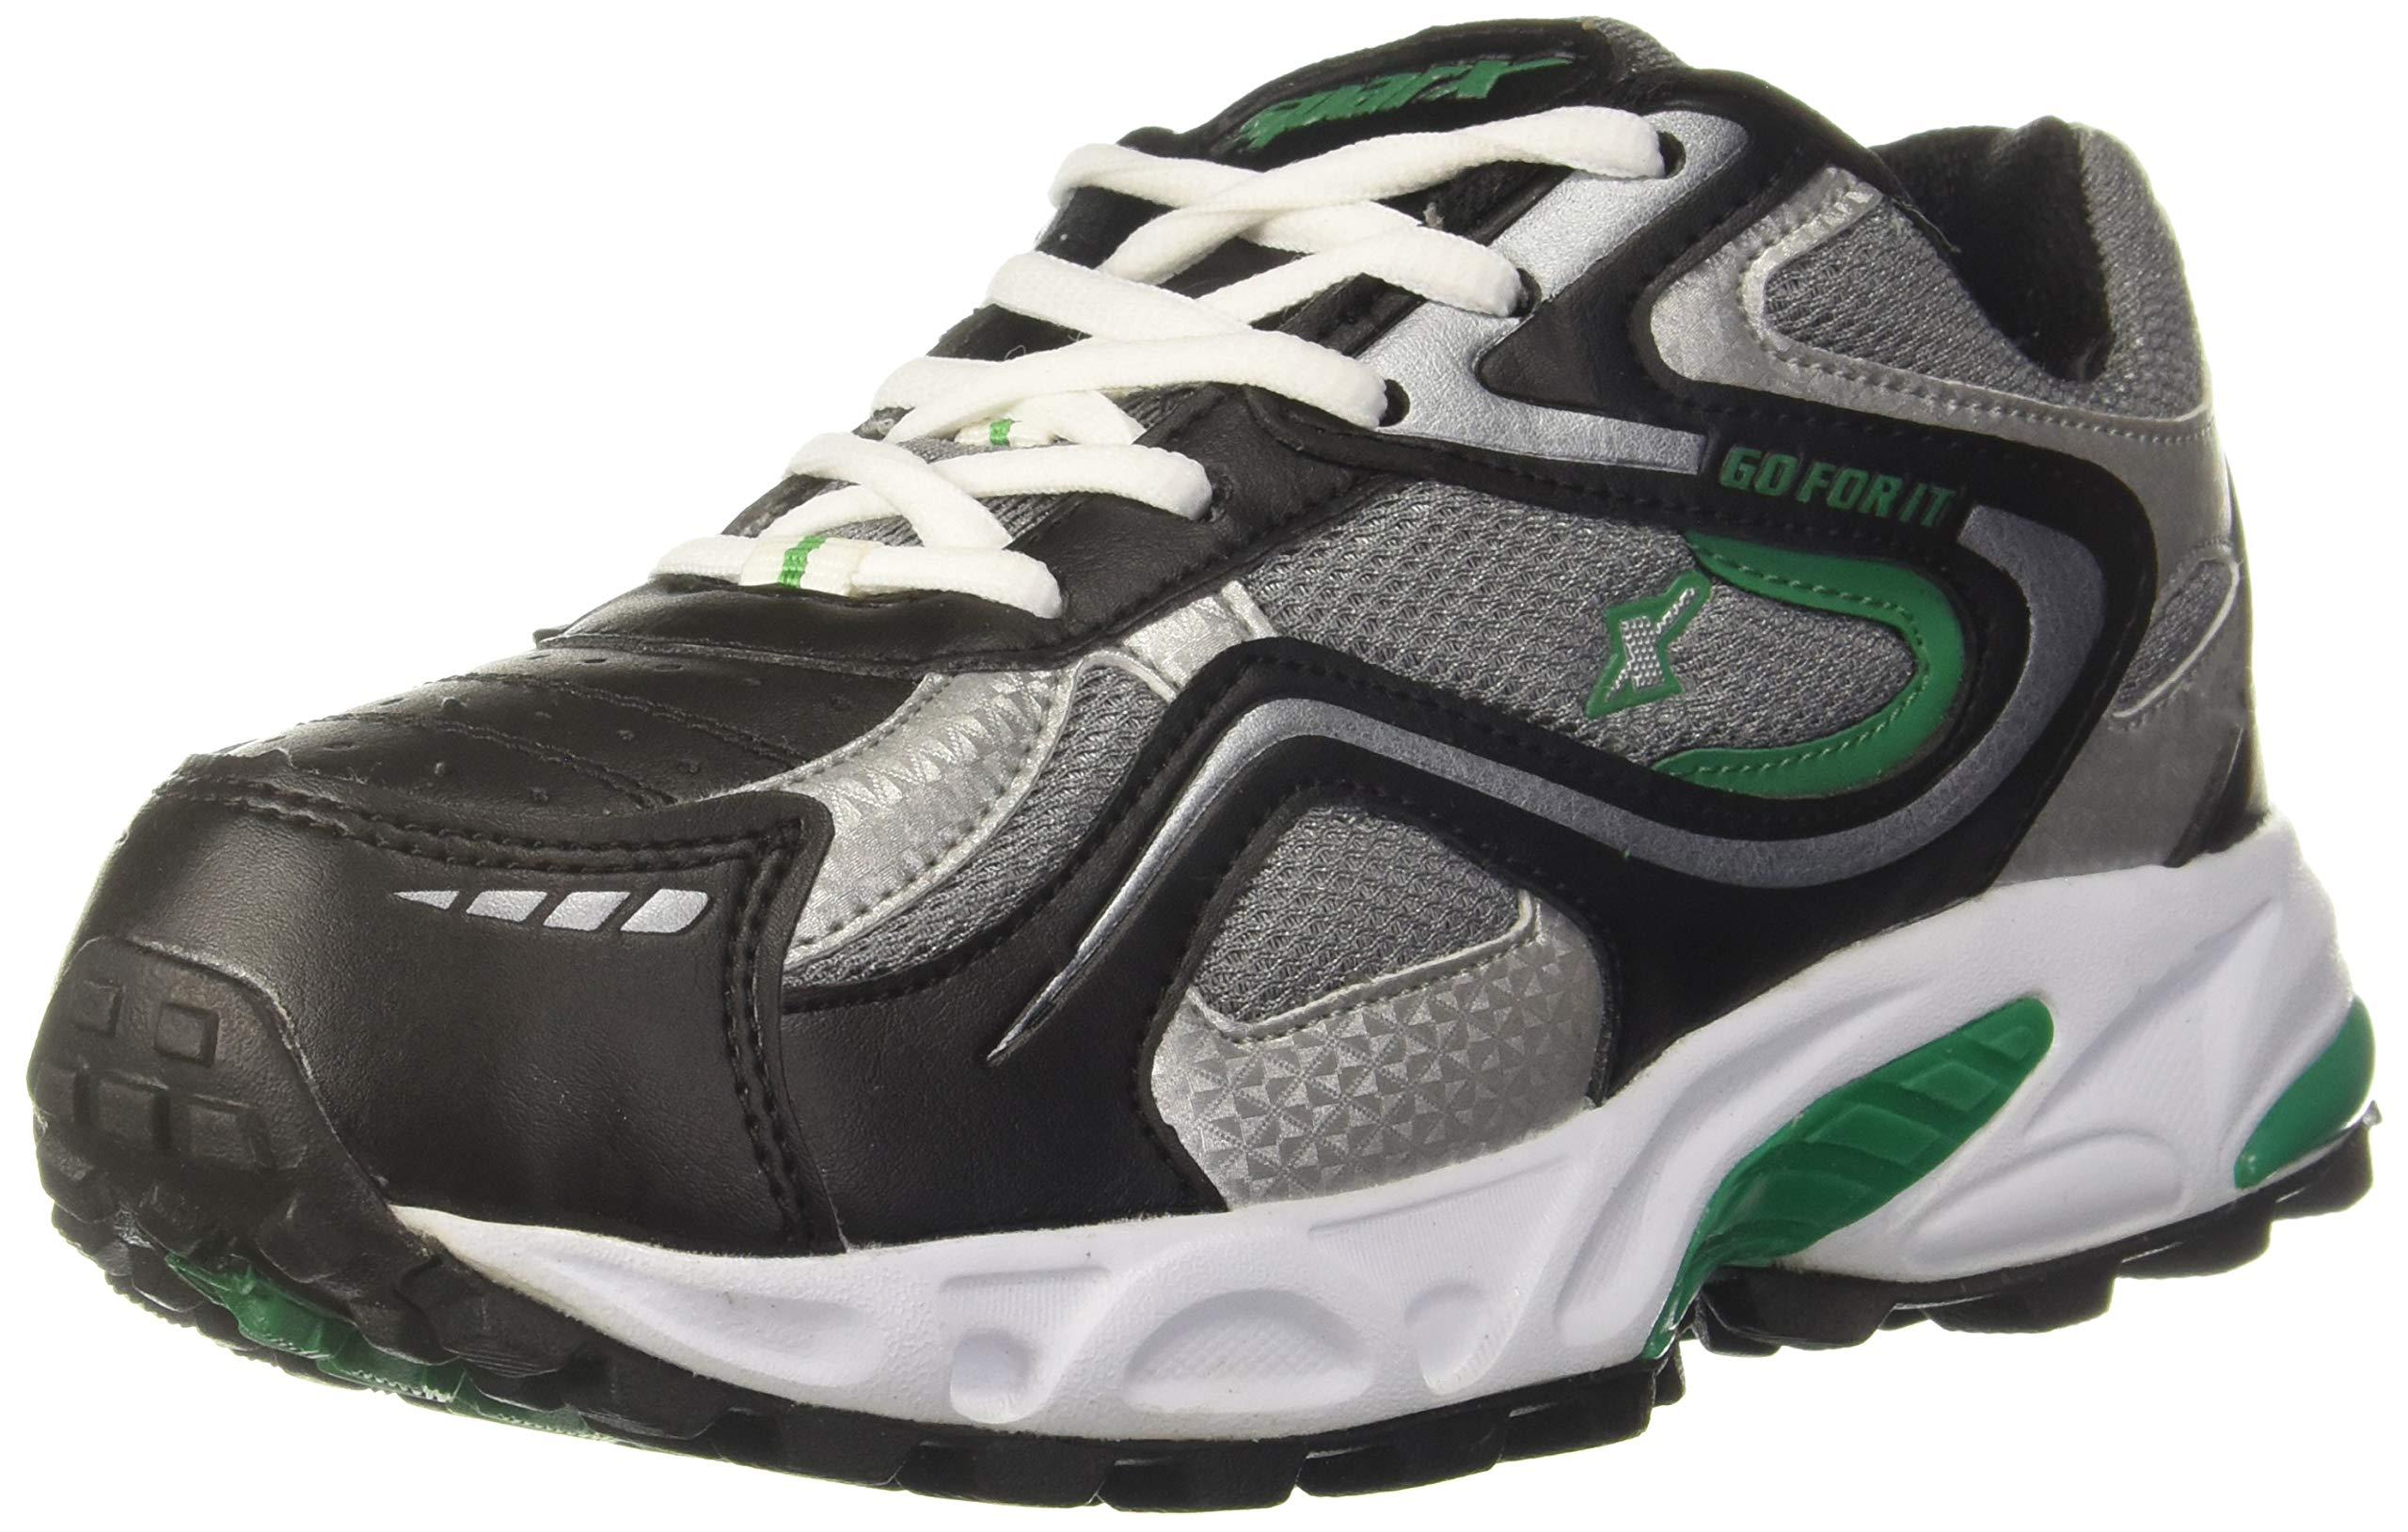 Sparx Men SM-171 Sports Shoes- Buy